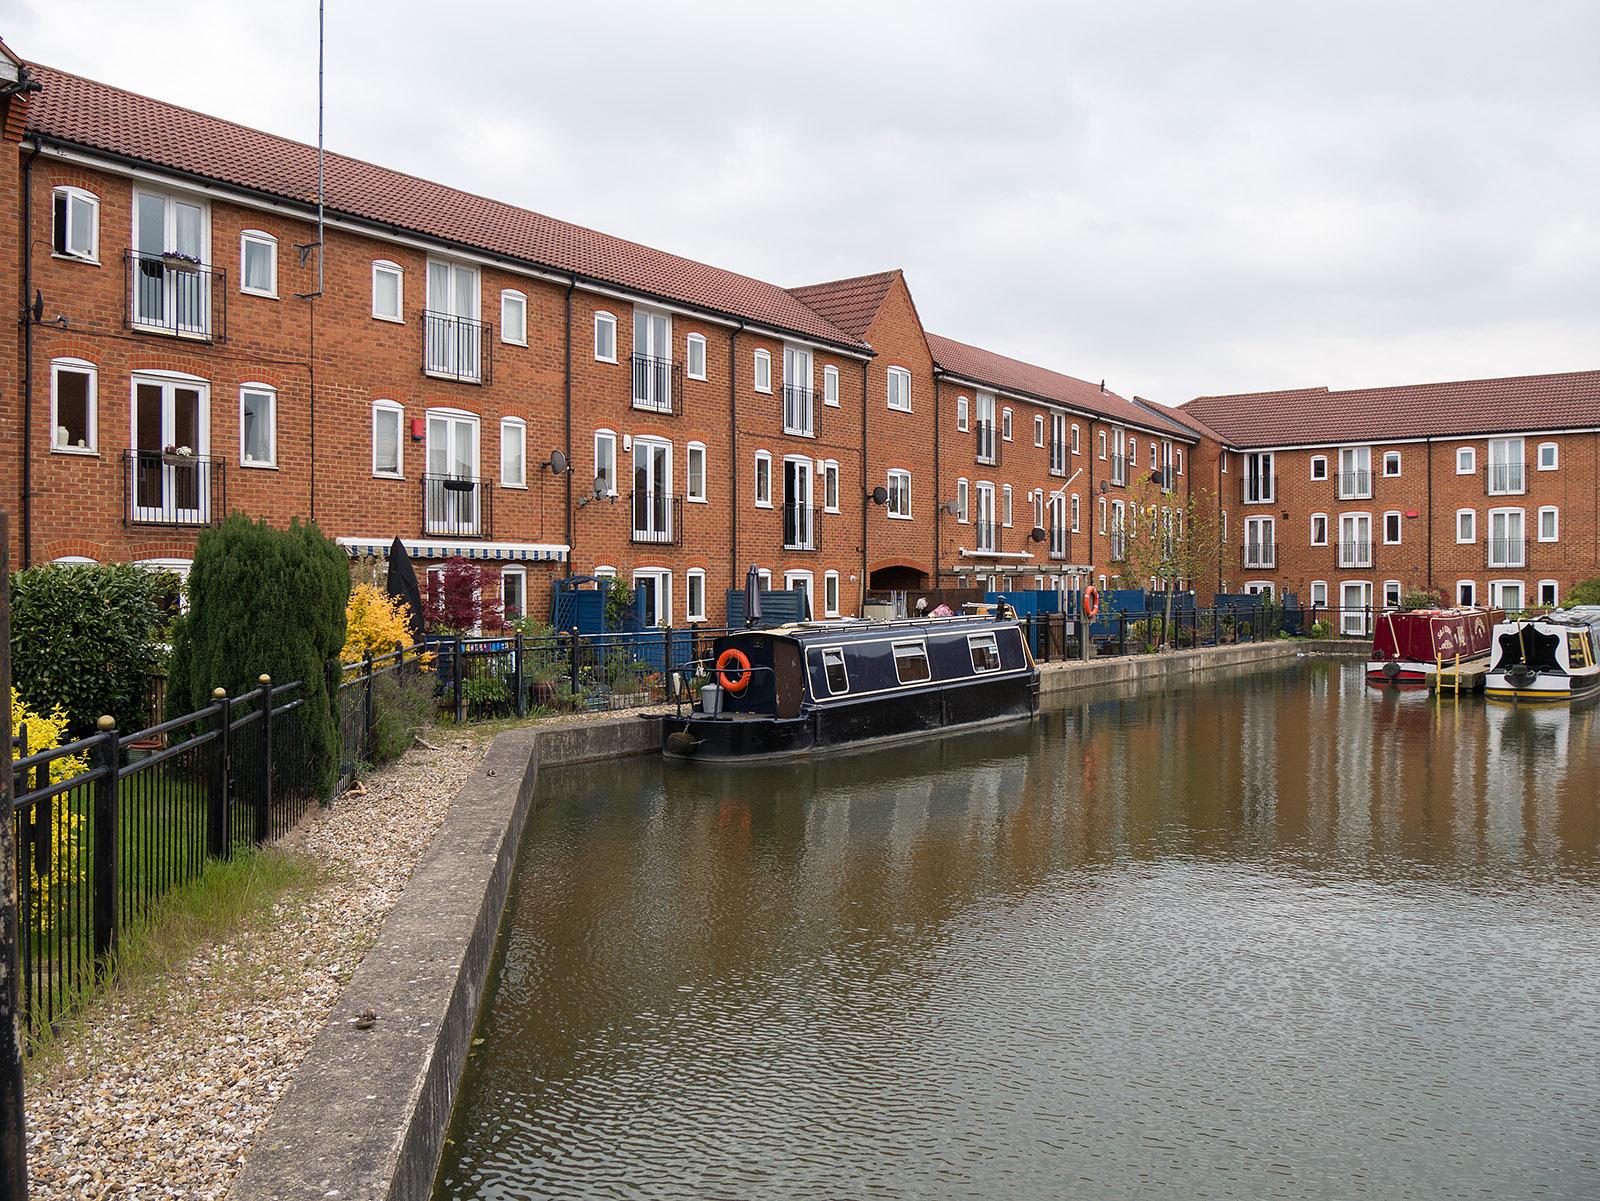 New private basin at Fenny Stratford